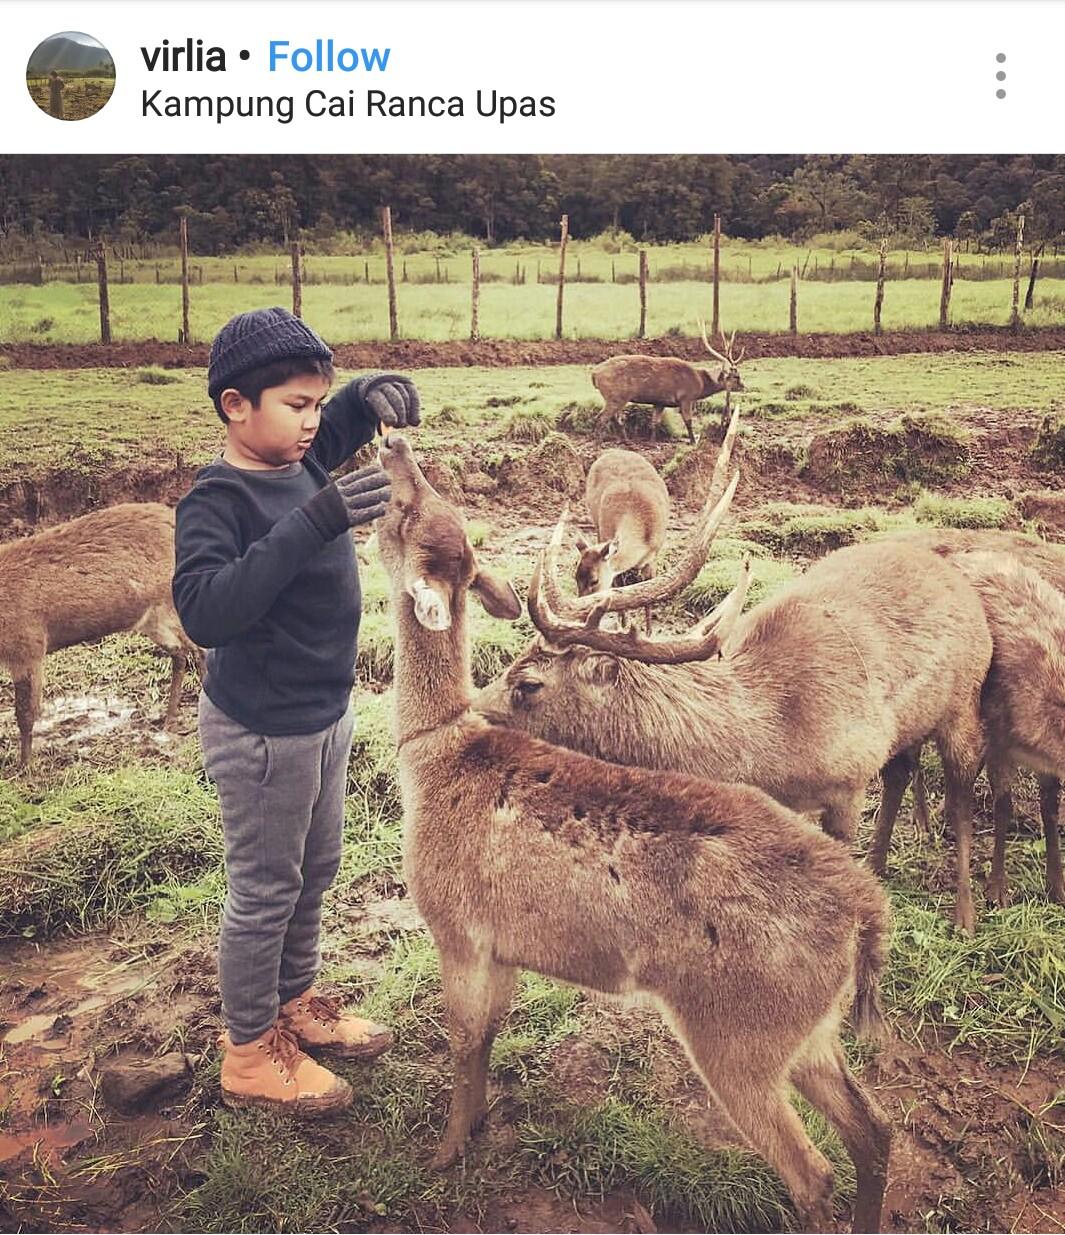 Konservasi Rusa Ranca Upas Ciwidey - Kids Holiday Spots - Liburan